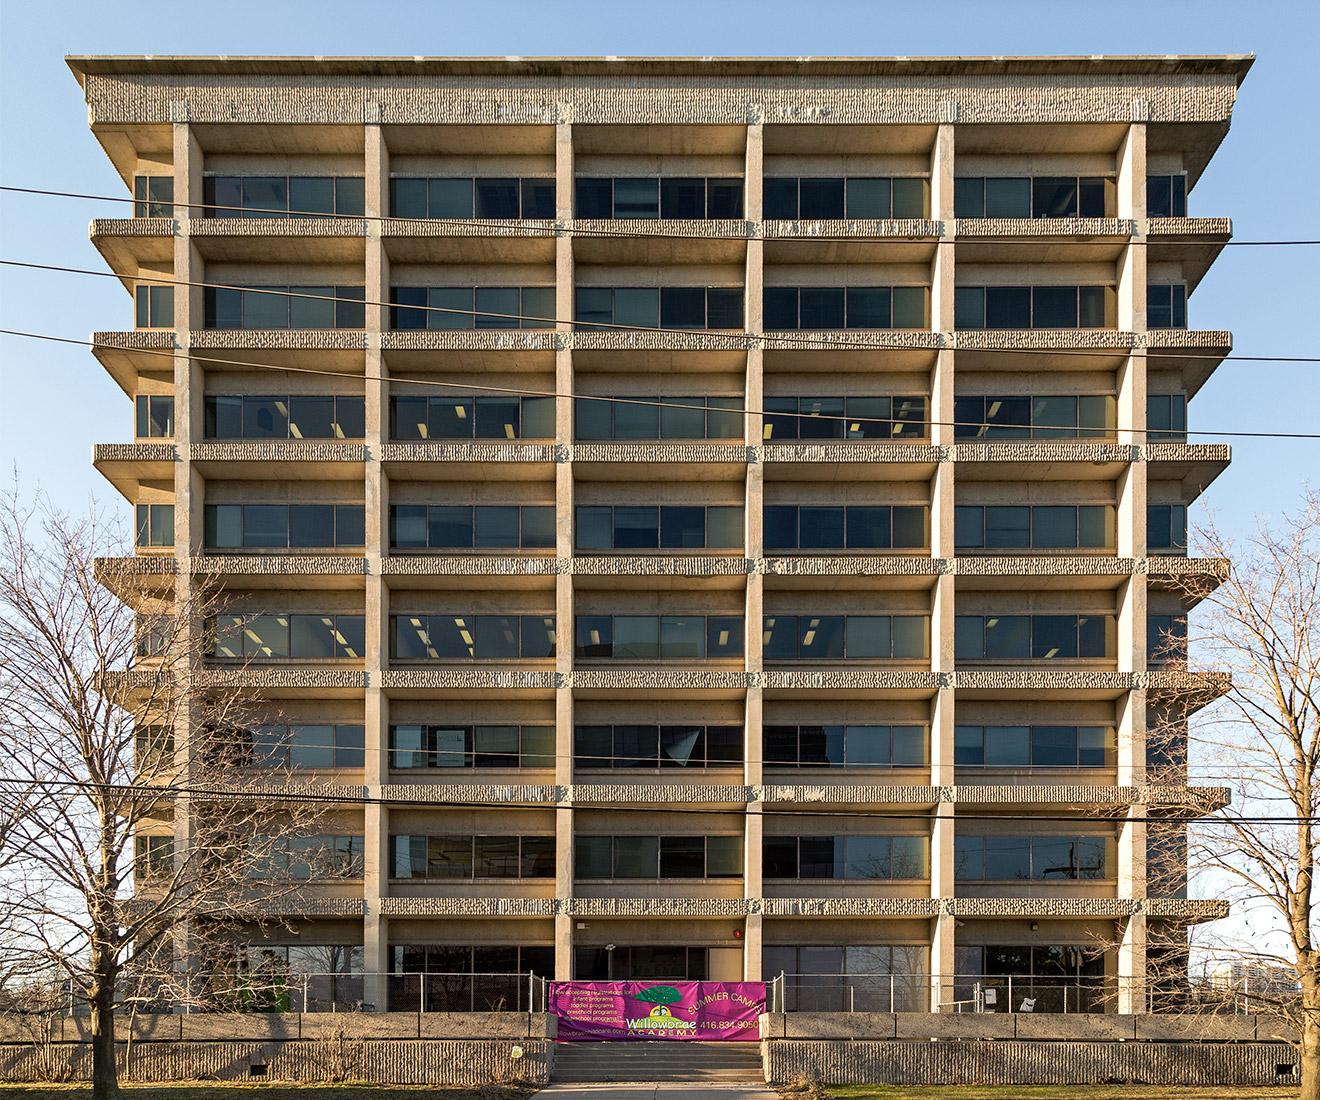 20160726. 1972 rough-hewn concrete modernism. 240 Duncan Mill Rd